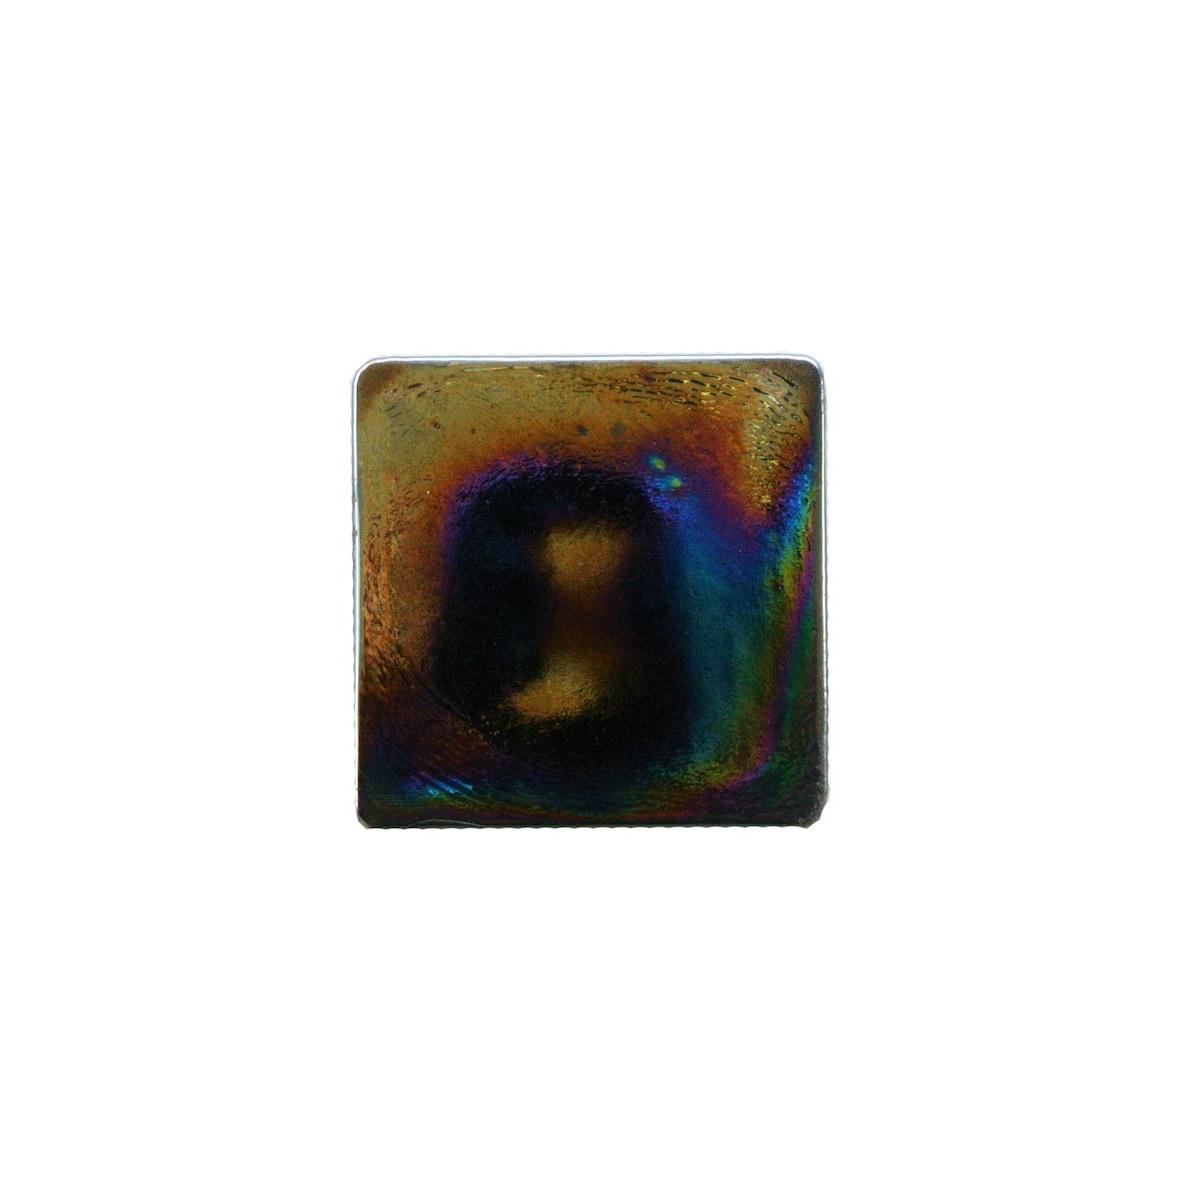 "Black Pearl Square / 2""x2"" Atmosphere 0"